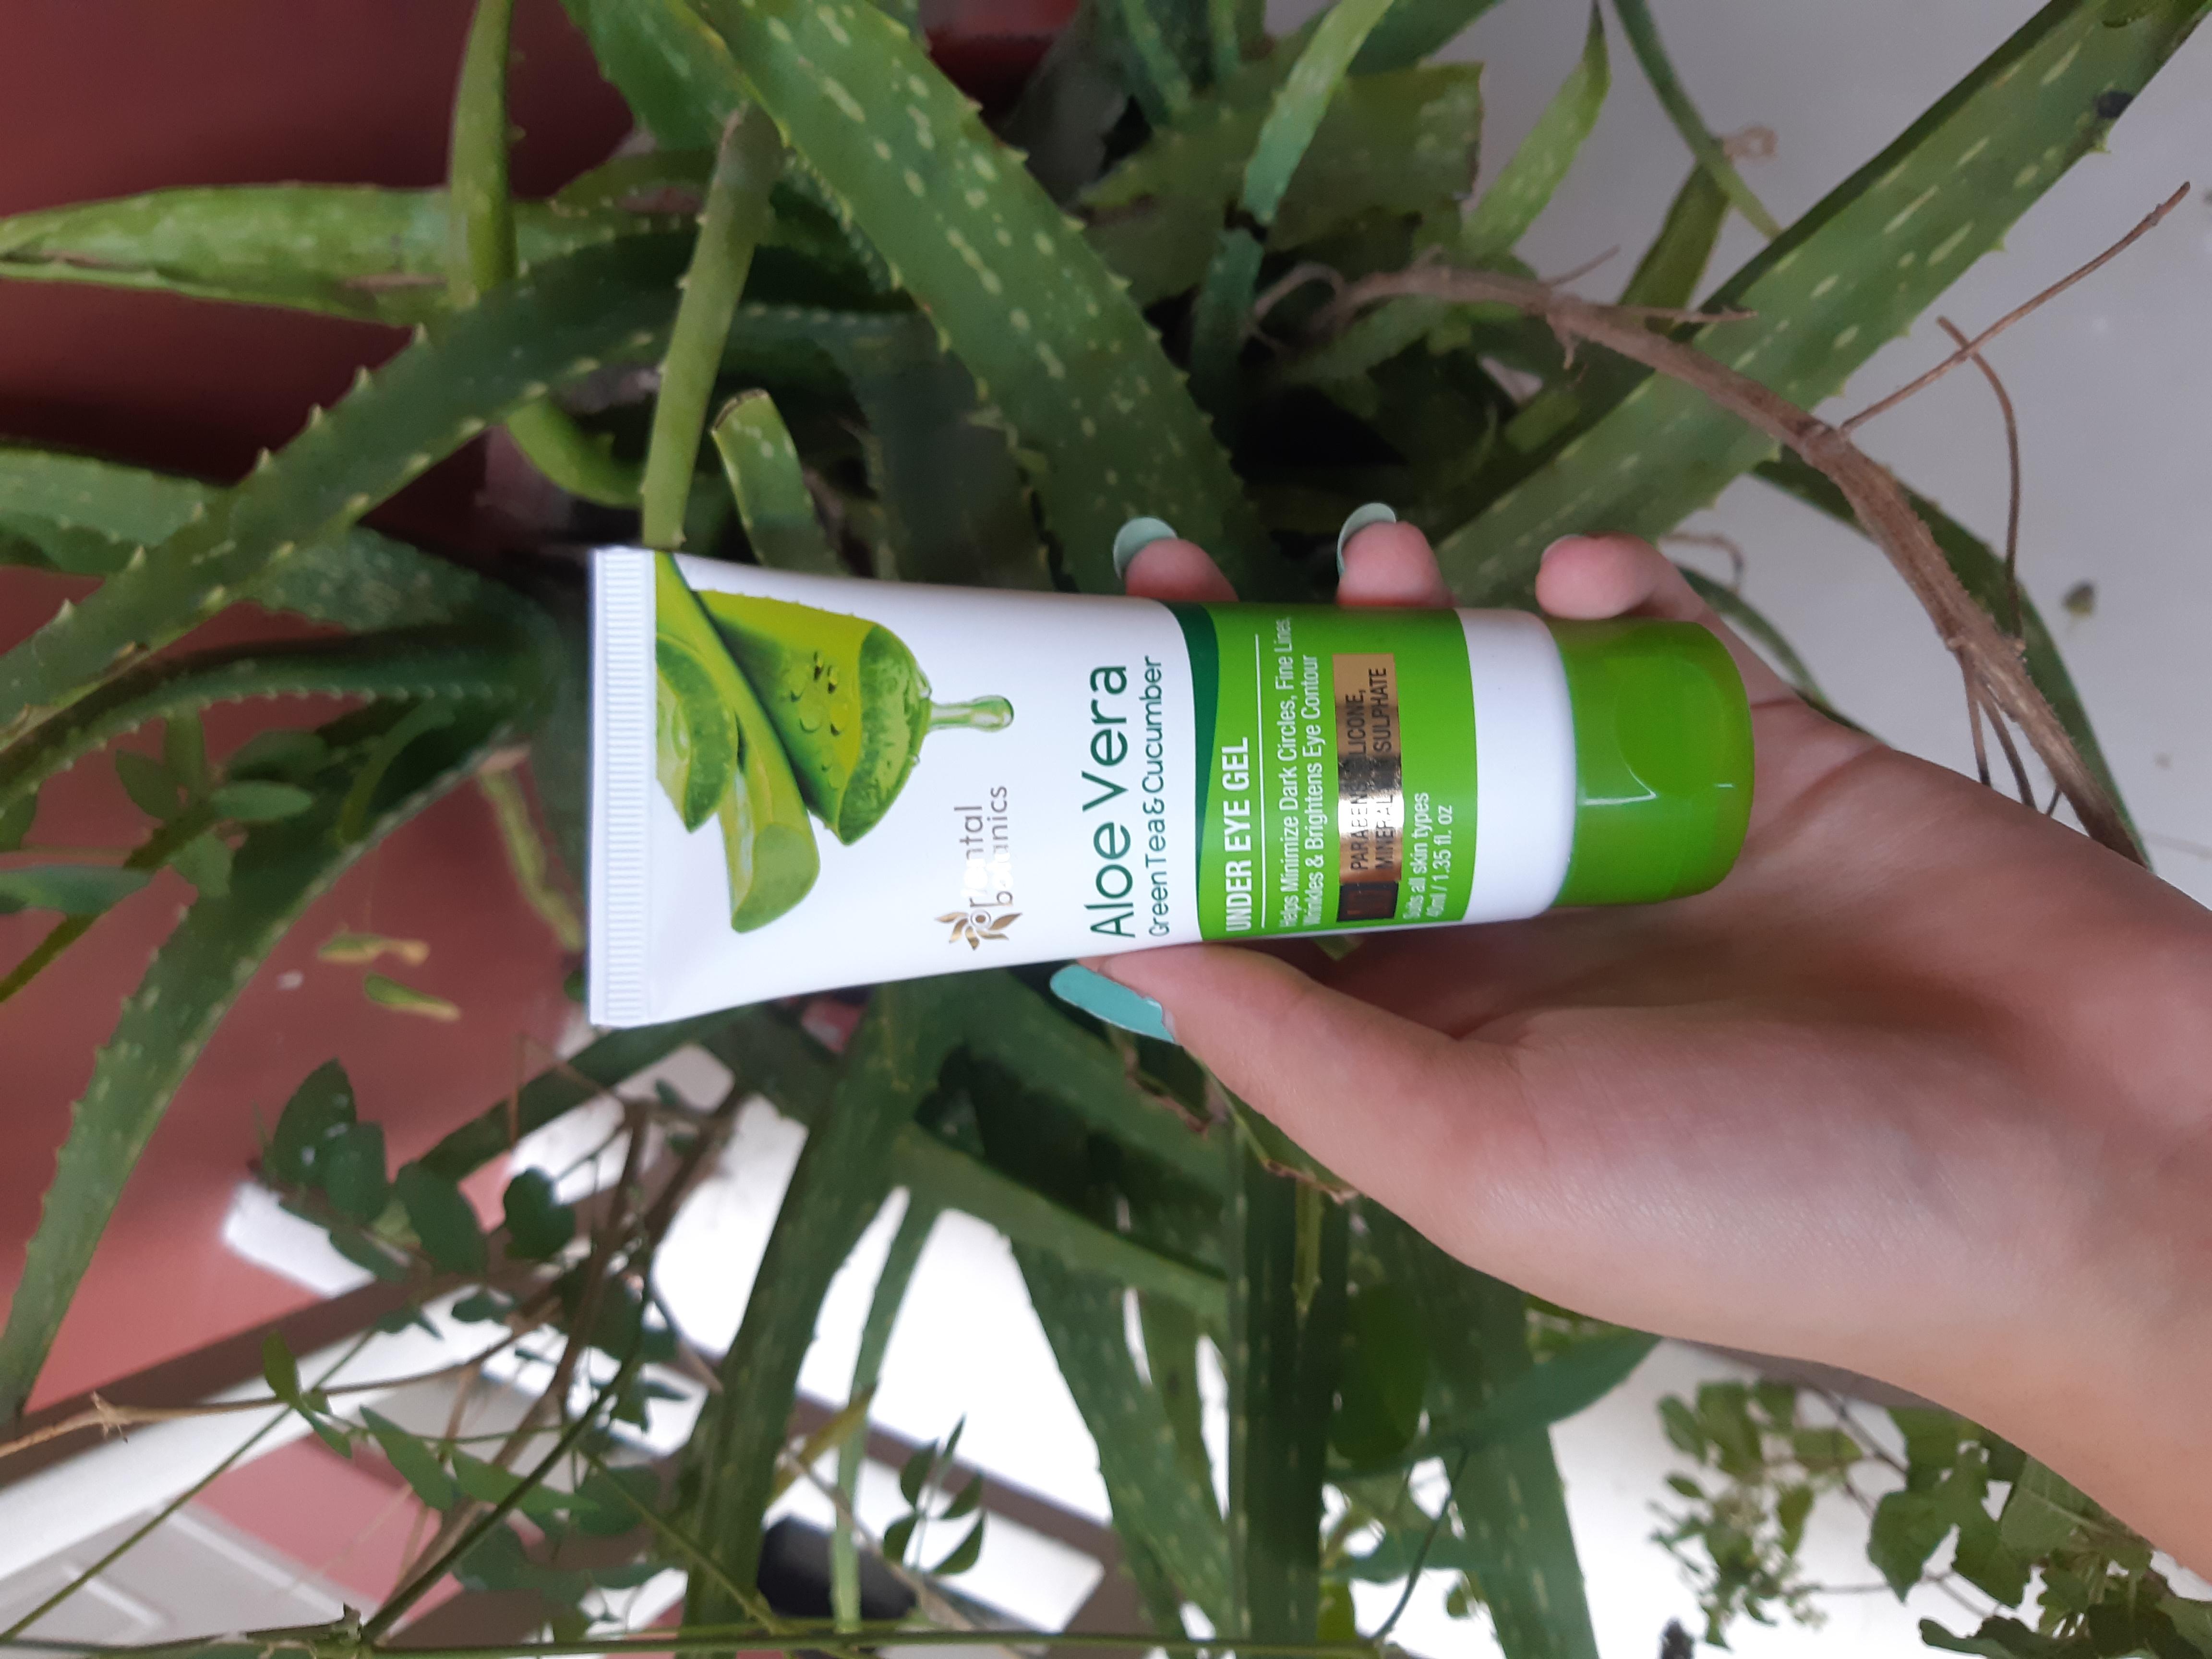 Oriental Botanics Aloe Vera Green Tea & Cucumber Under Eye Gel -Miracle Product for Dark Circles-By madhureema_roy_moulik